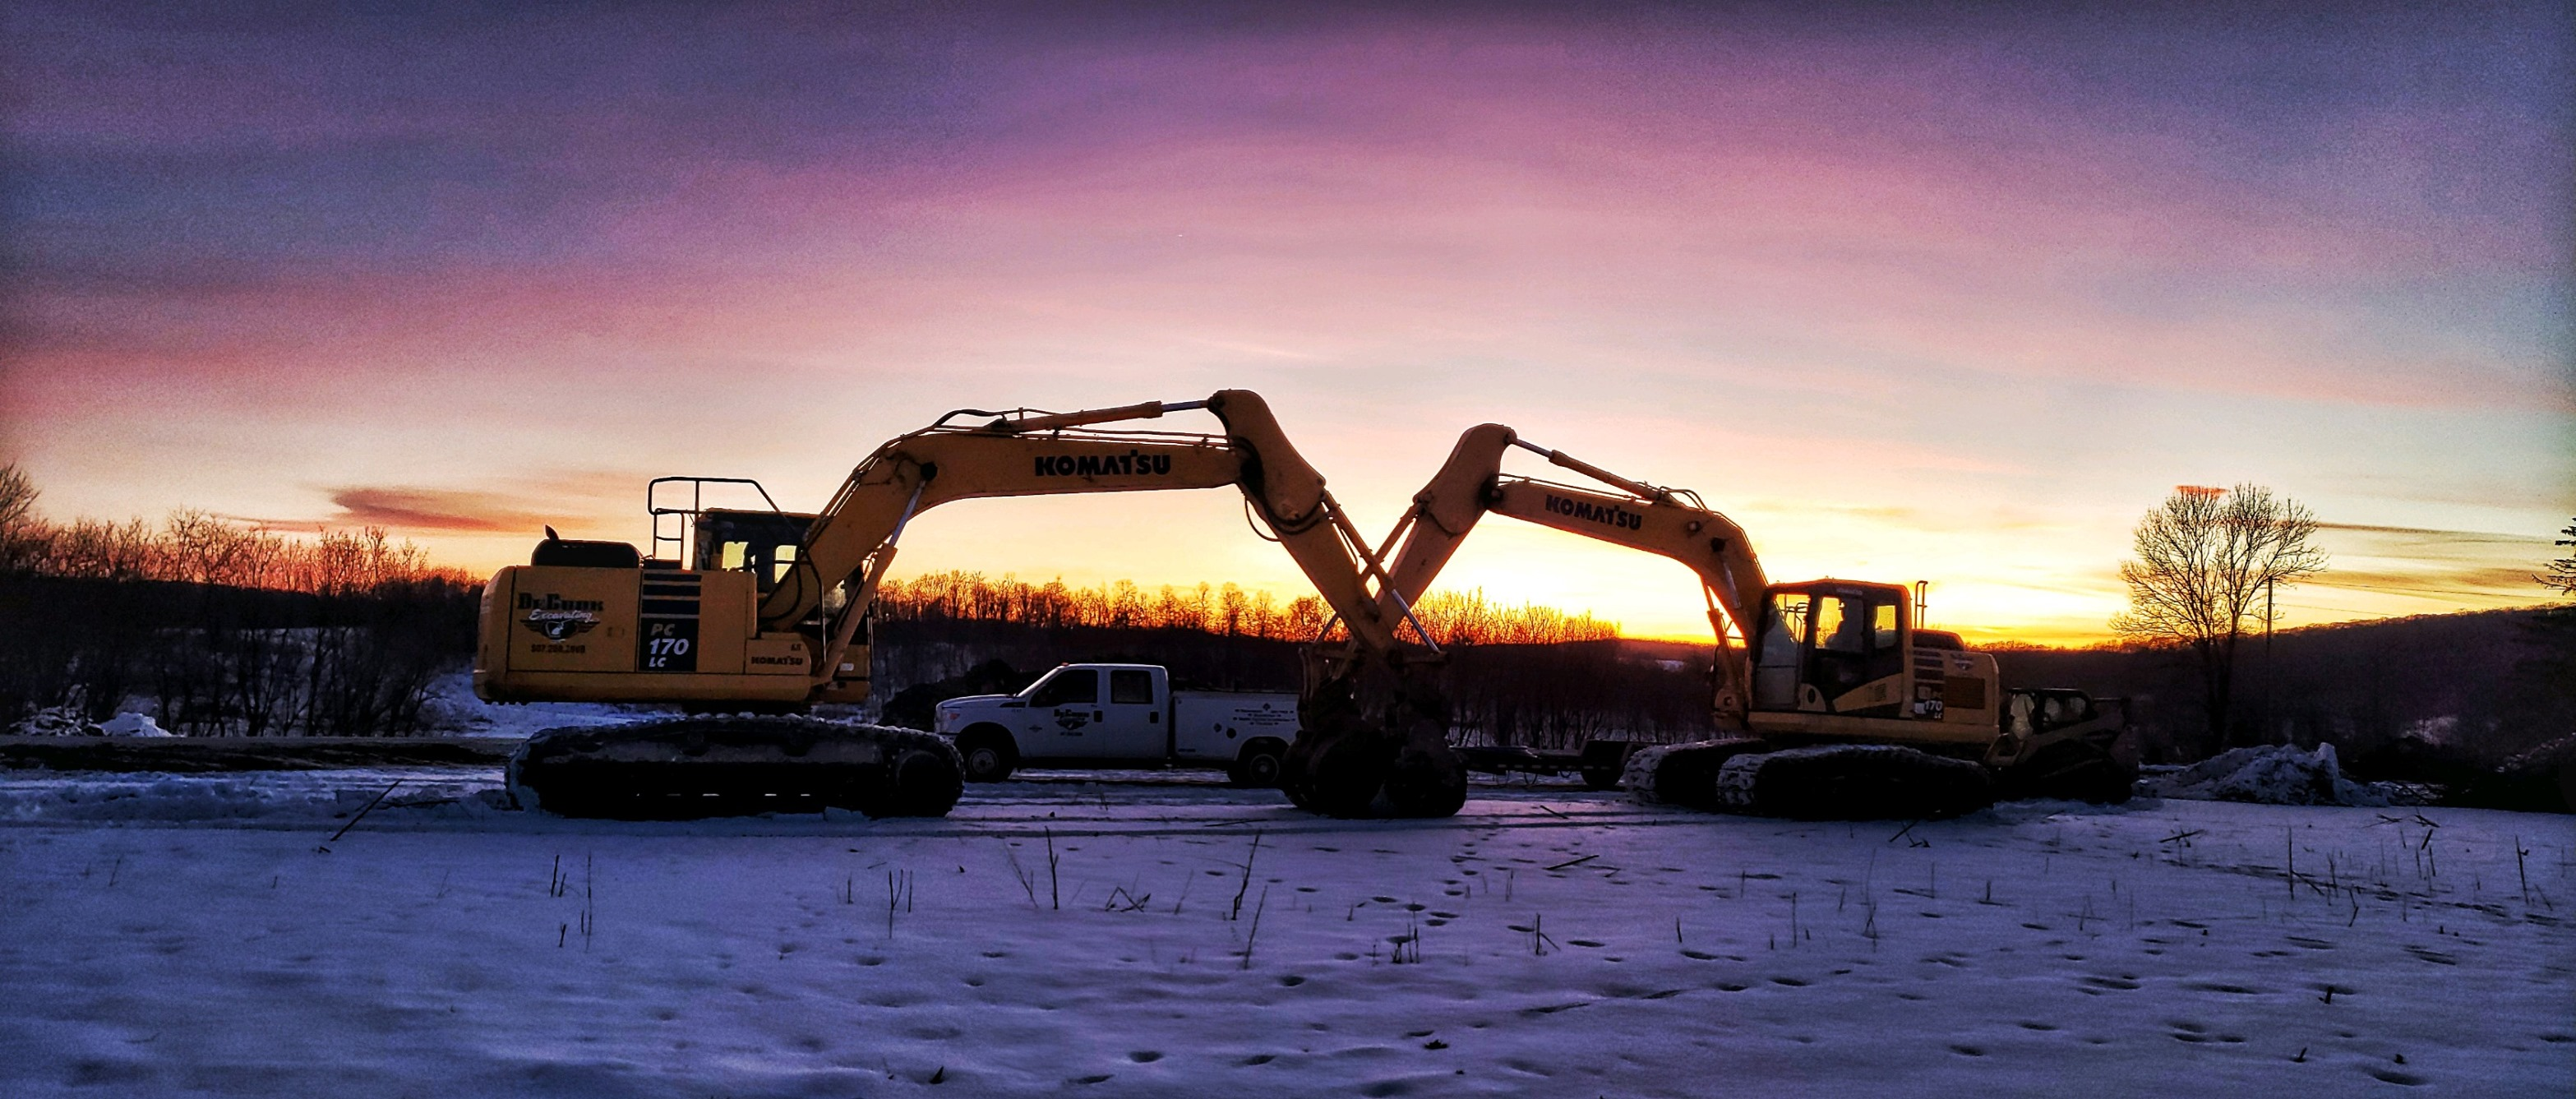 2 Excavators.jpg